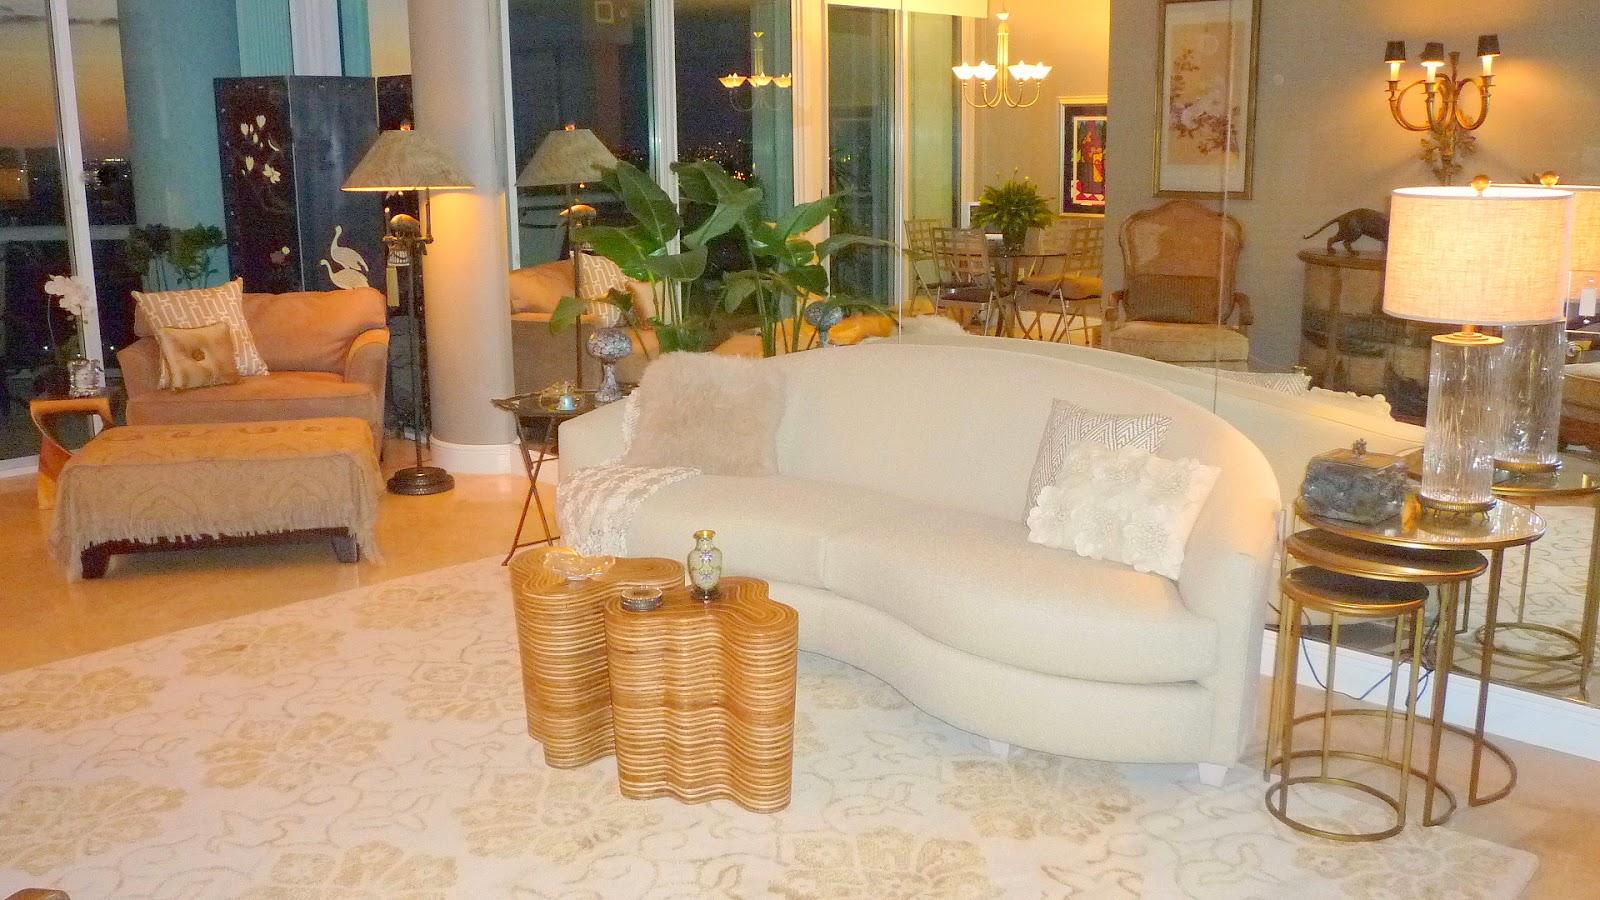 Robin lechner interior designs interior design trends - Interior design trends 2015 ...